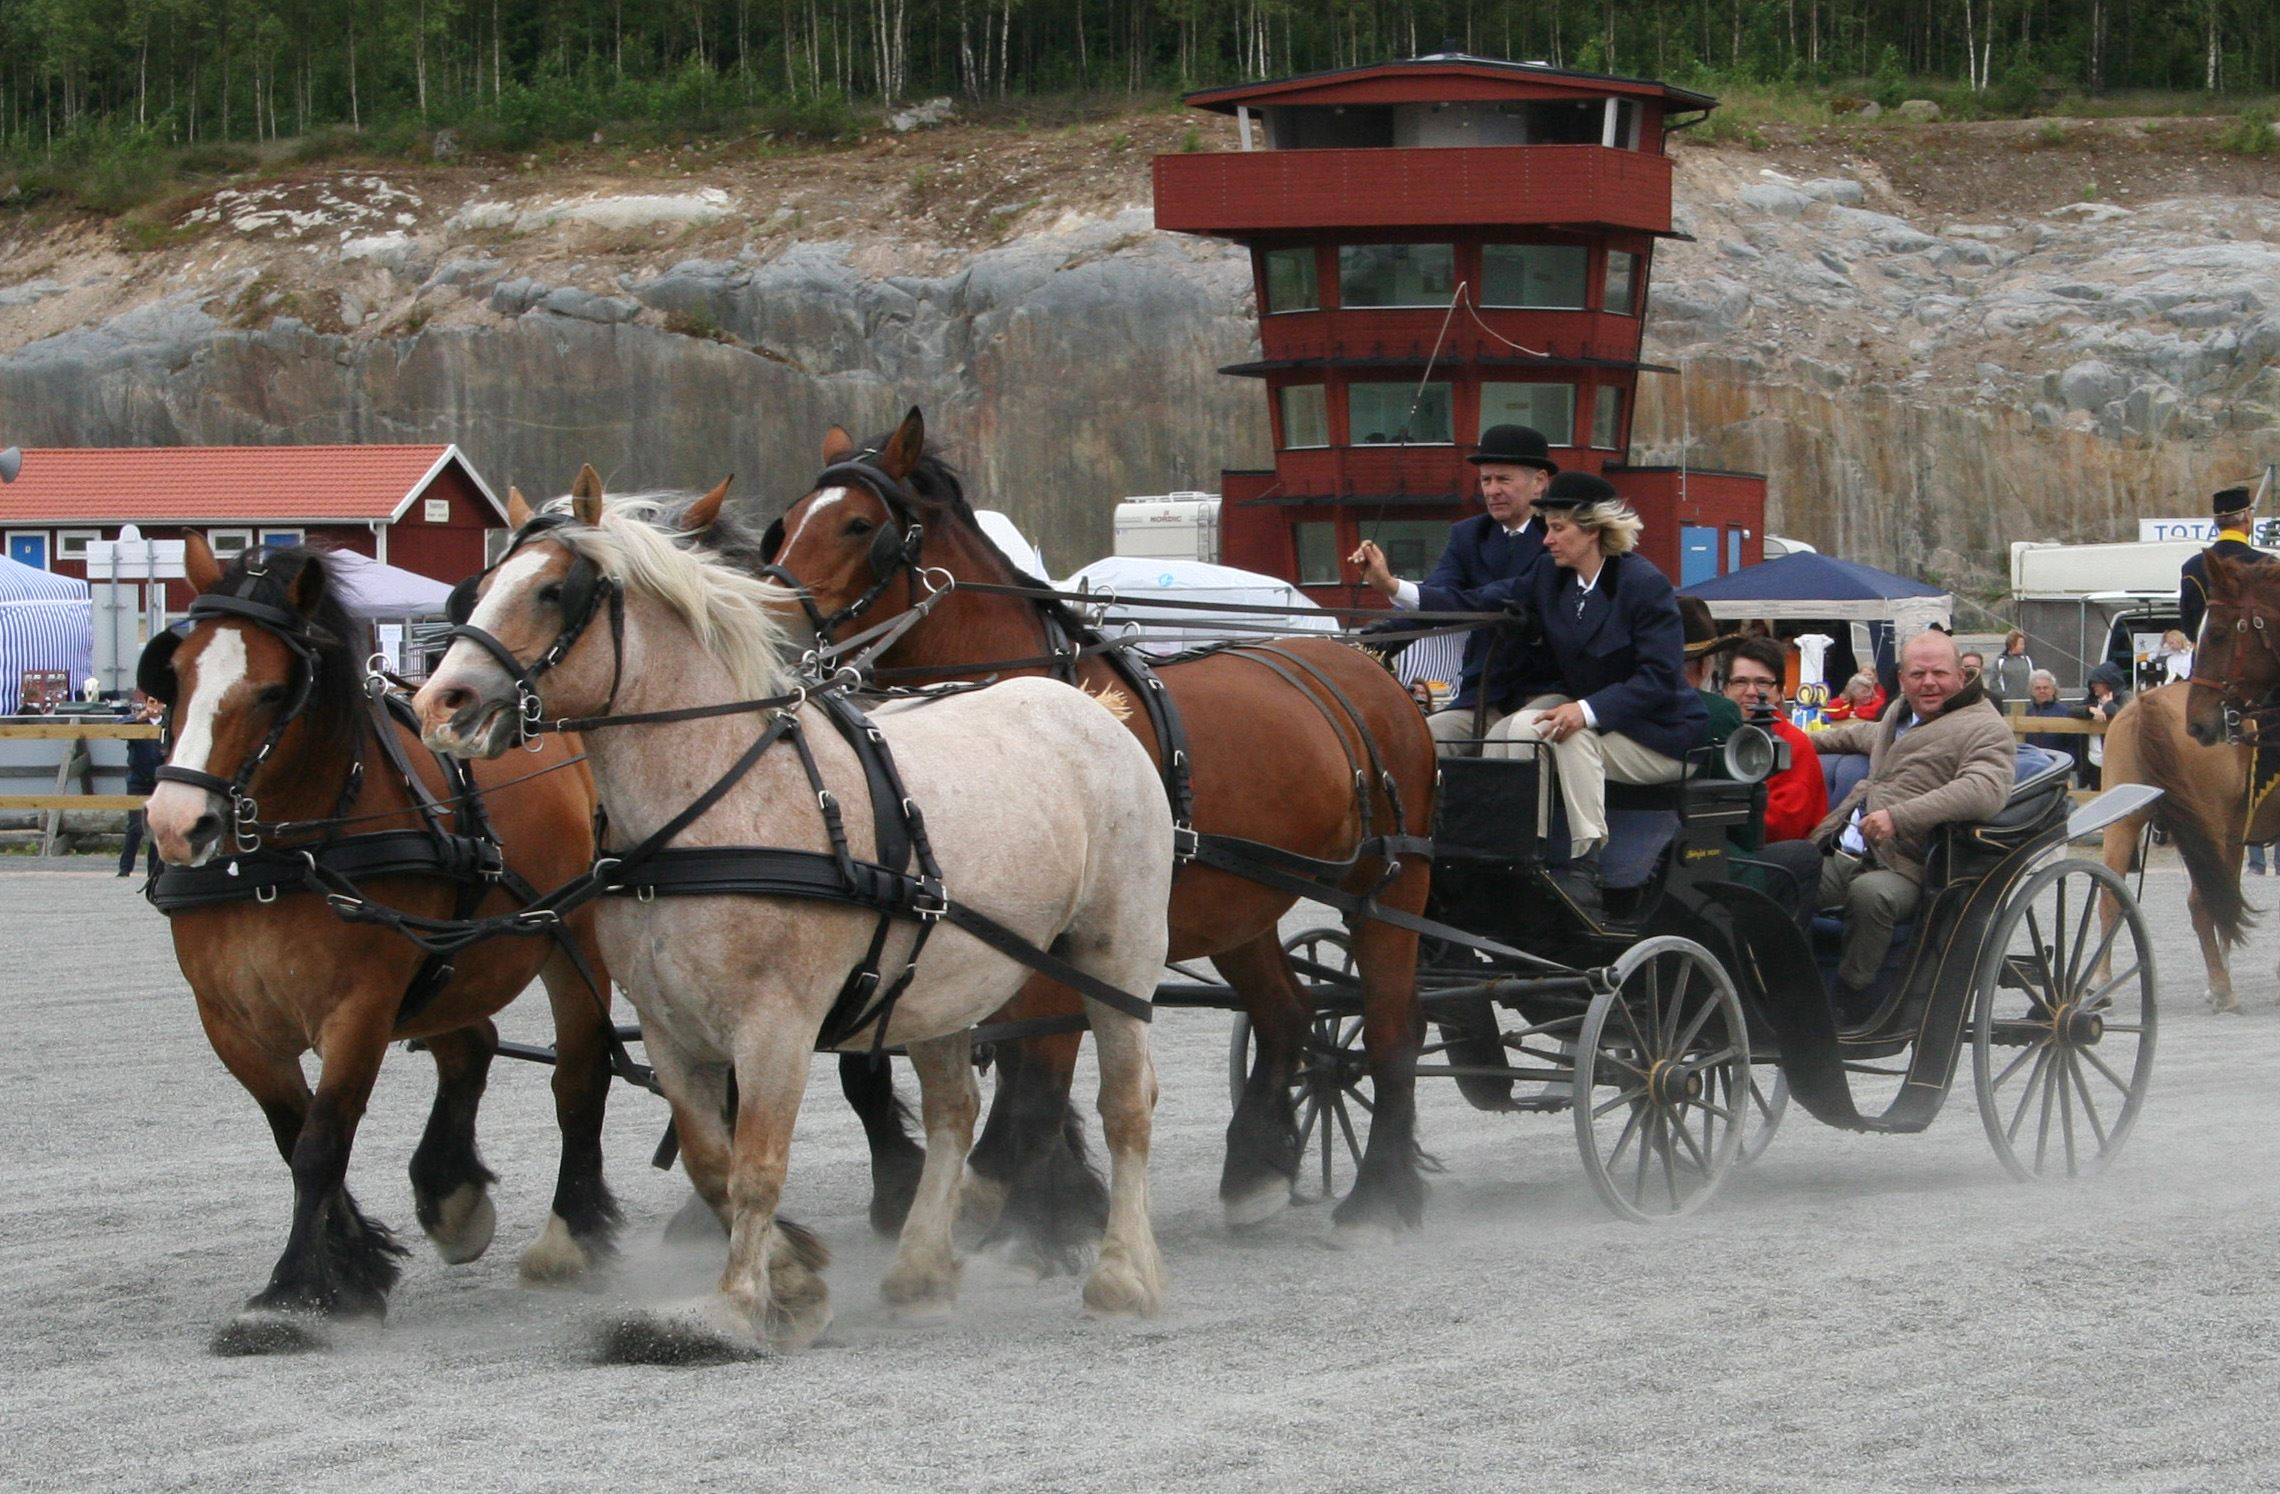 © Tingsryds Kommun, Vagnkörning